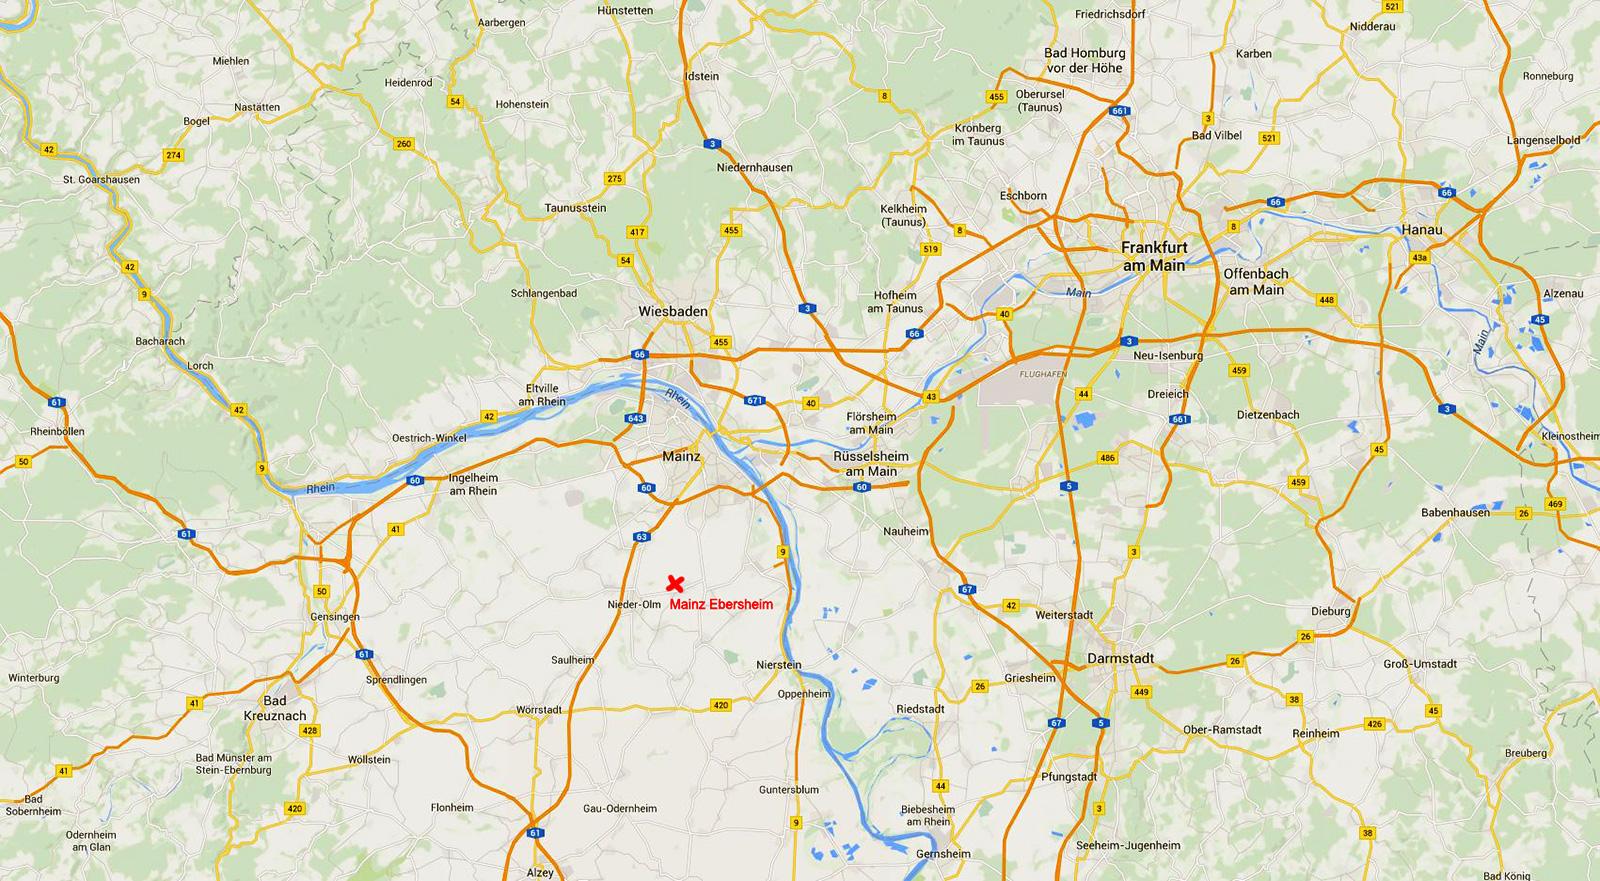 Mainz_Ebersheim_Map